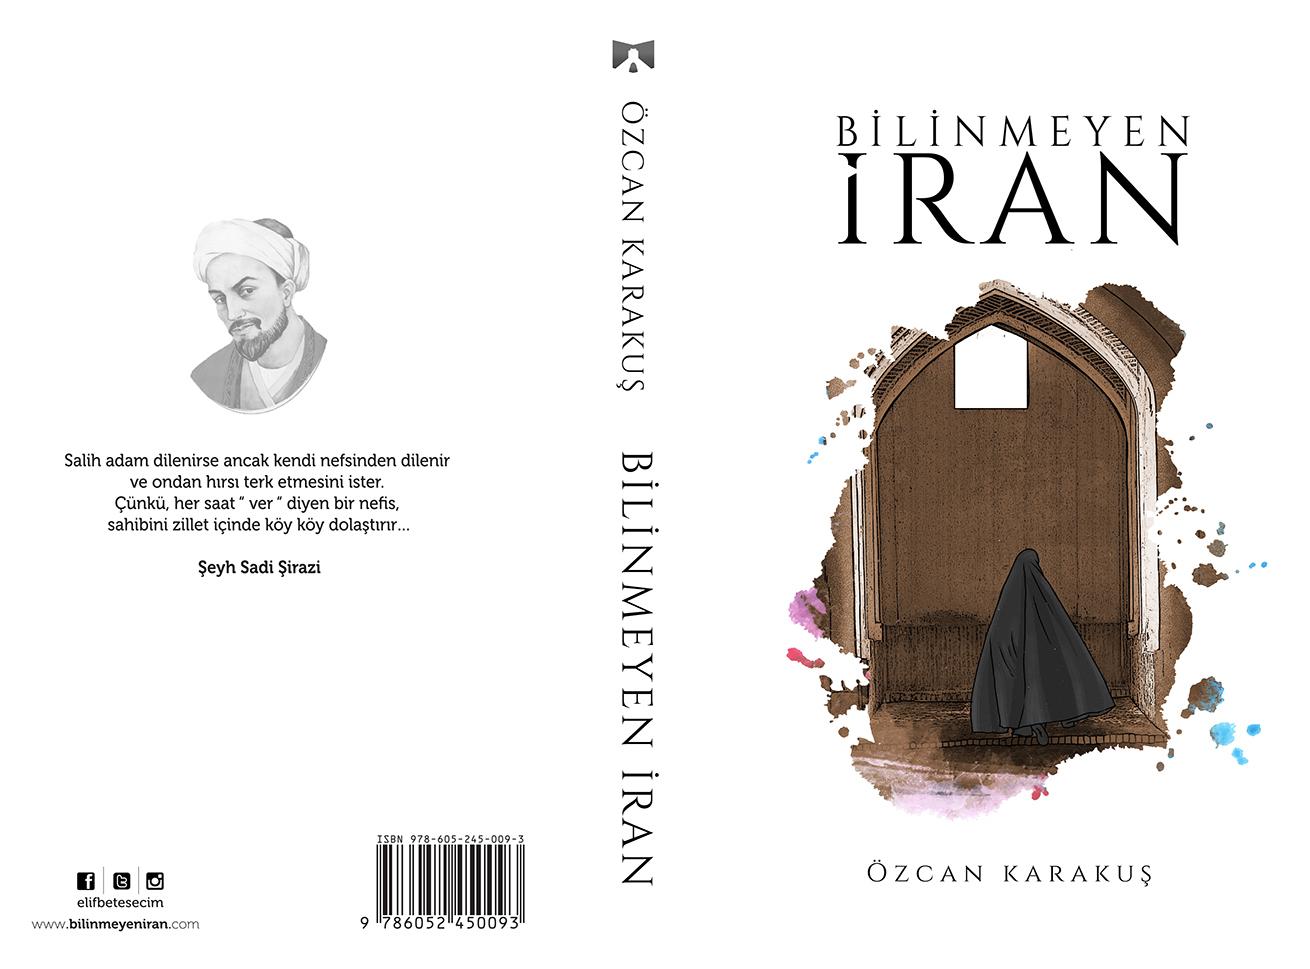 kitap kapağı çizimi,Kitap kapağı tasarımı,Kapak çizimi,Bilinmeyen İran,Bilinmeyen İran kapak,kitap budur,Yayın evi kitap kapağı,Kitap dış yüz çizimi,Kitap ön yüz tasarım,Bilinmeyeniran.com,Elifbetesecim